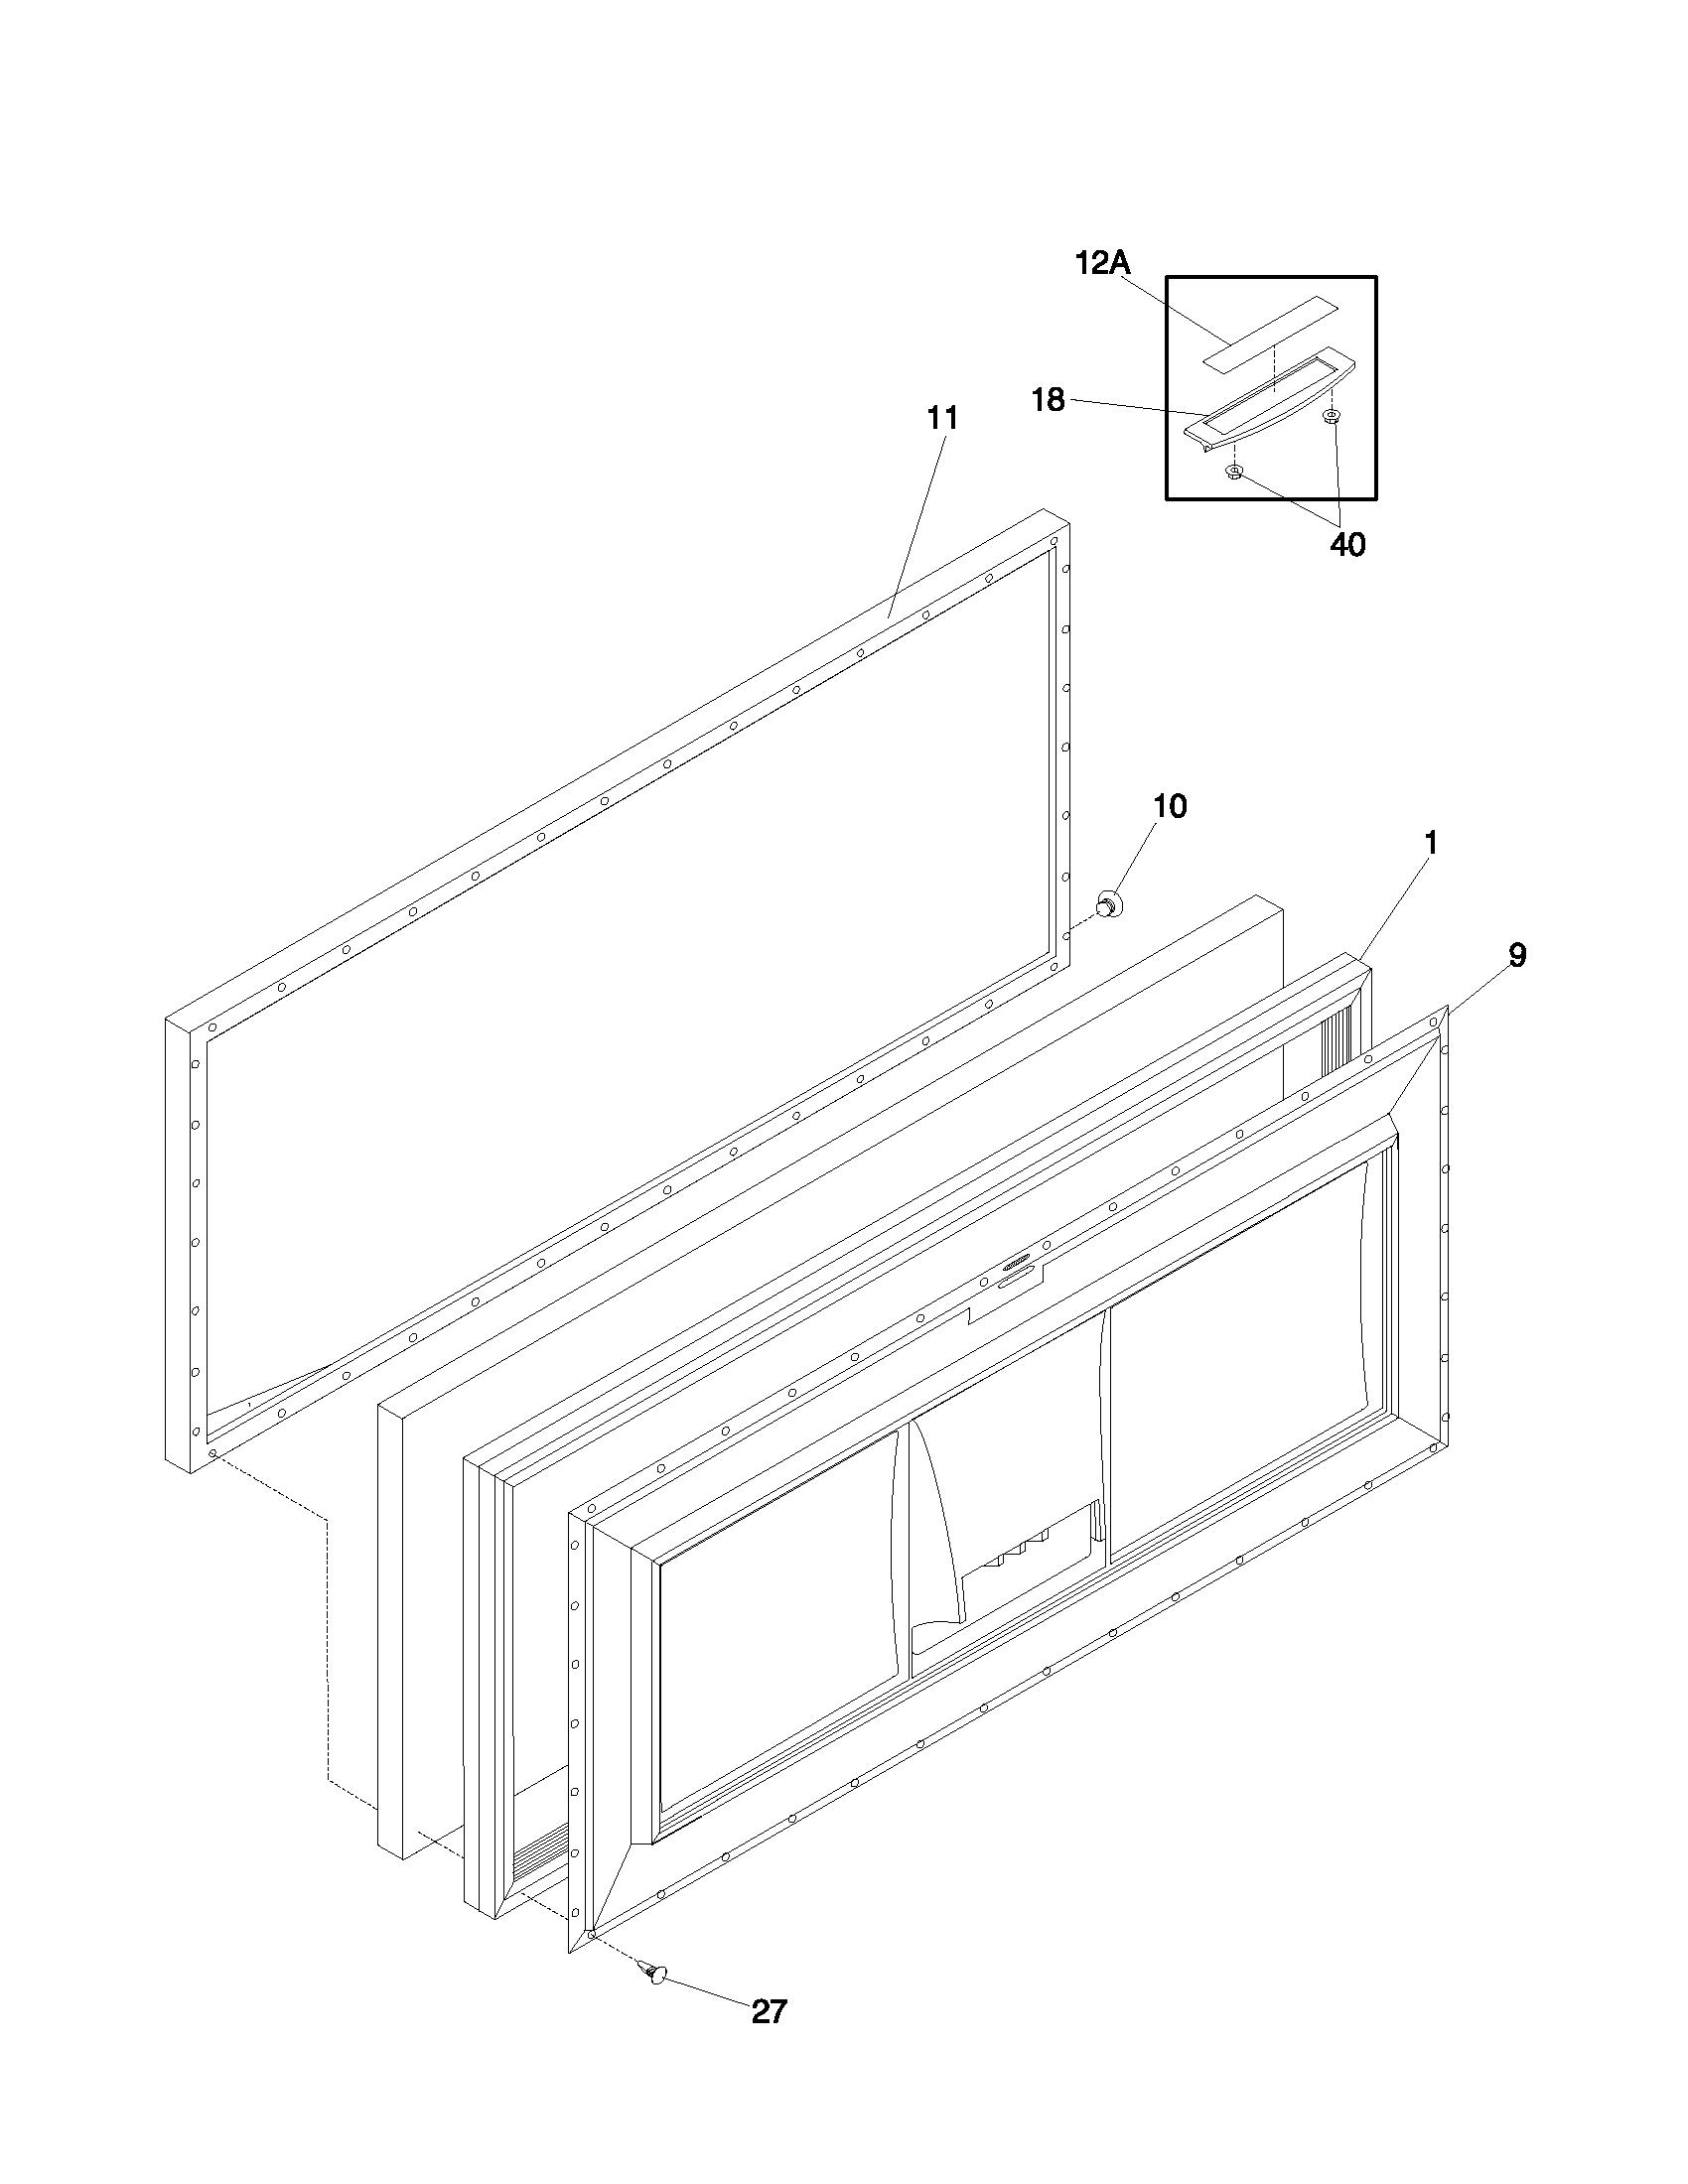 DOOR Diagram & Parts List for Model ffc09c3aw1 Frigidaire